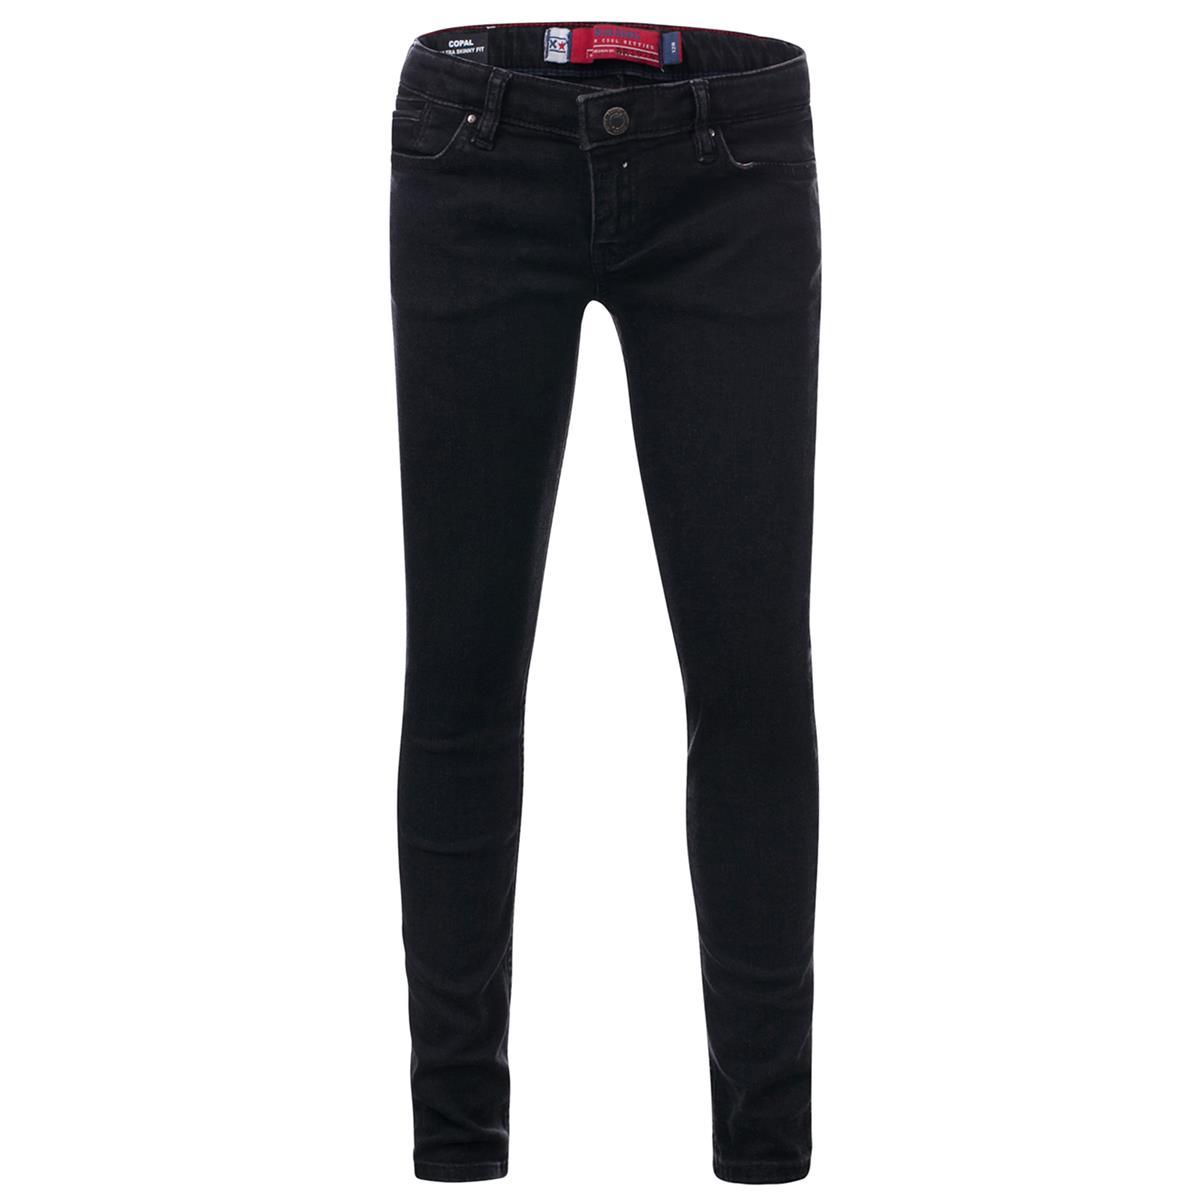 ed6539eb2d Blue Rebel COPAL - ultra skinny fit jeans - Black wash - betties